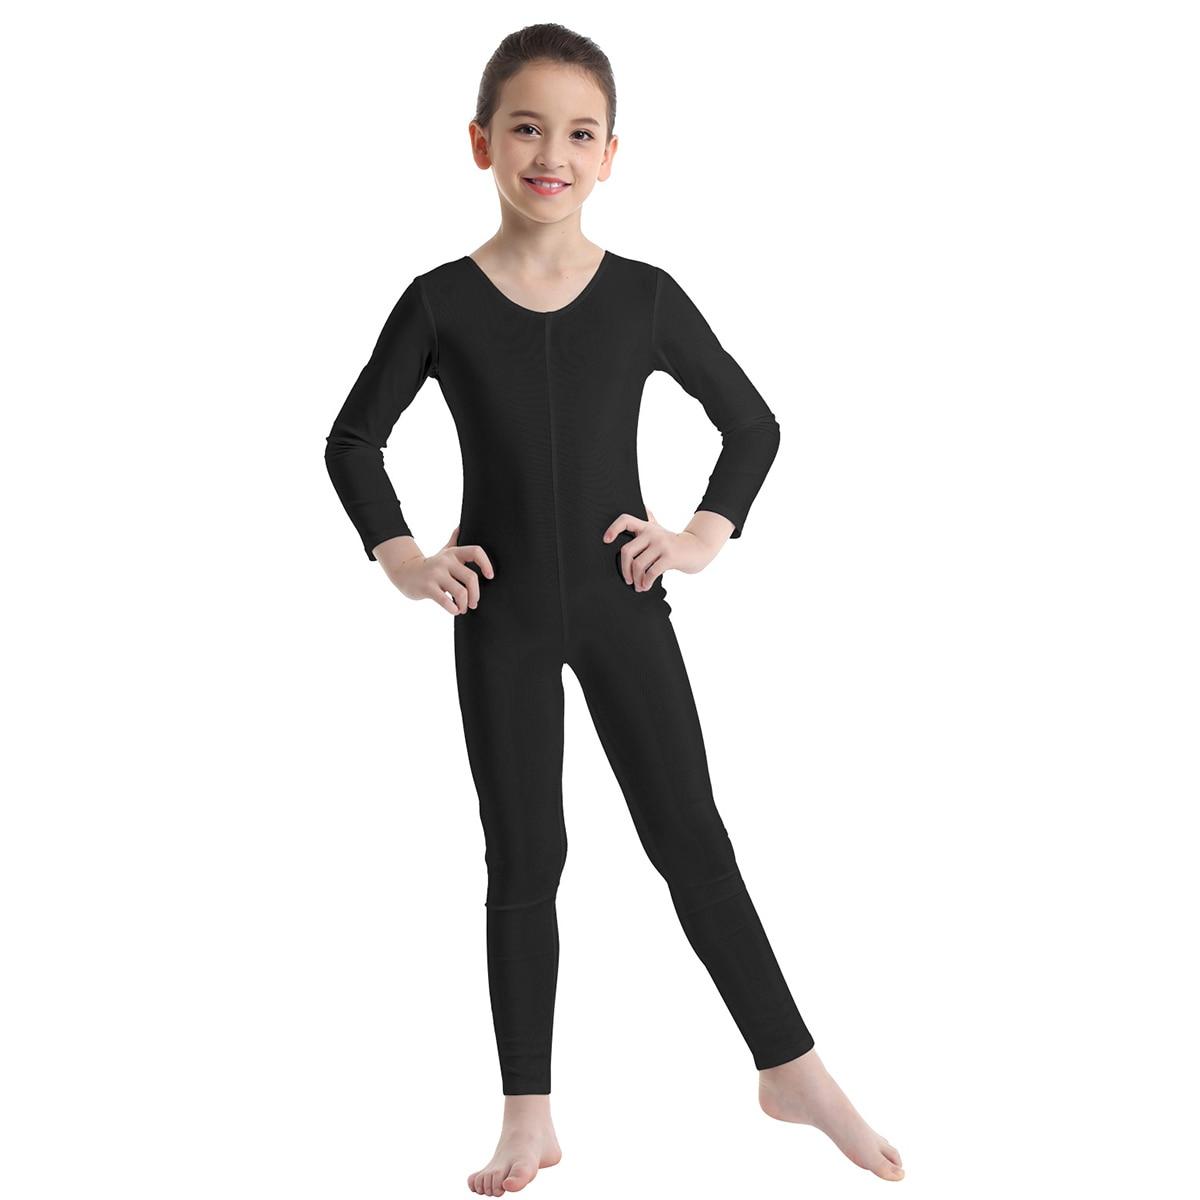 Kids Girls Gymnastics Ballet Dance Leotard Unitard Long Sleeve Workout Jumpsuit